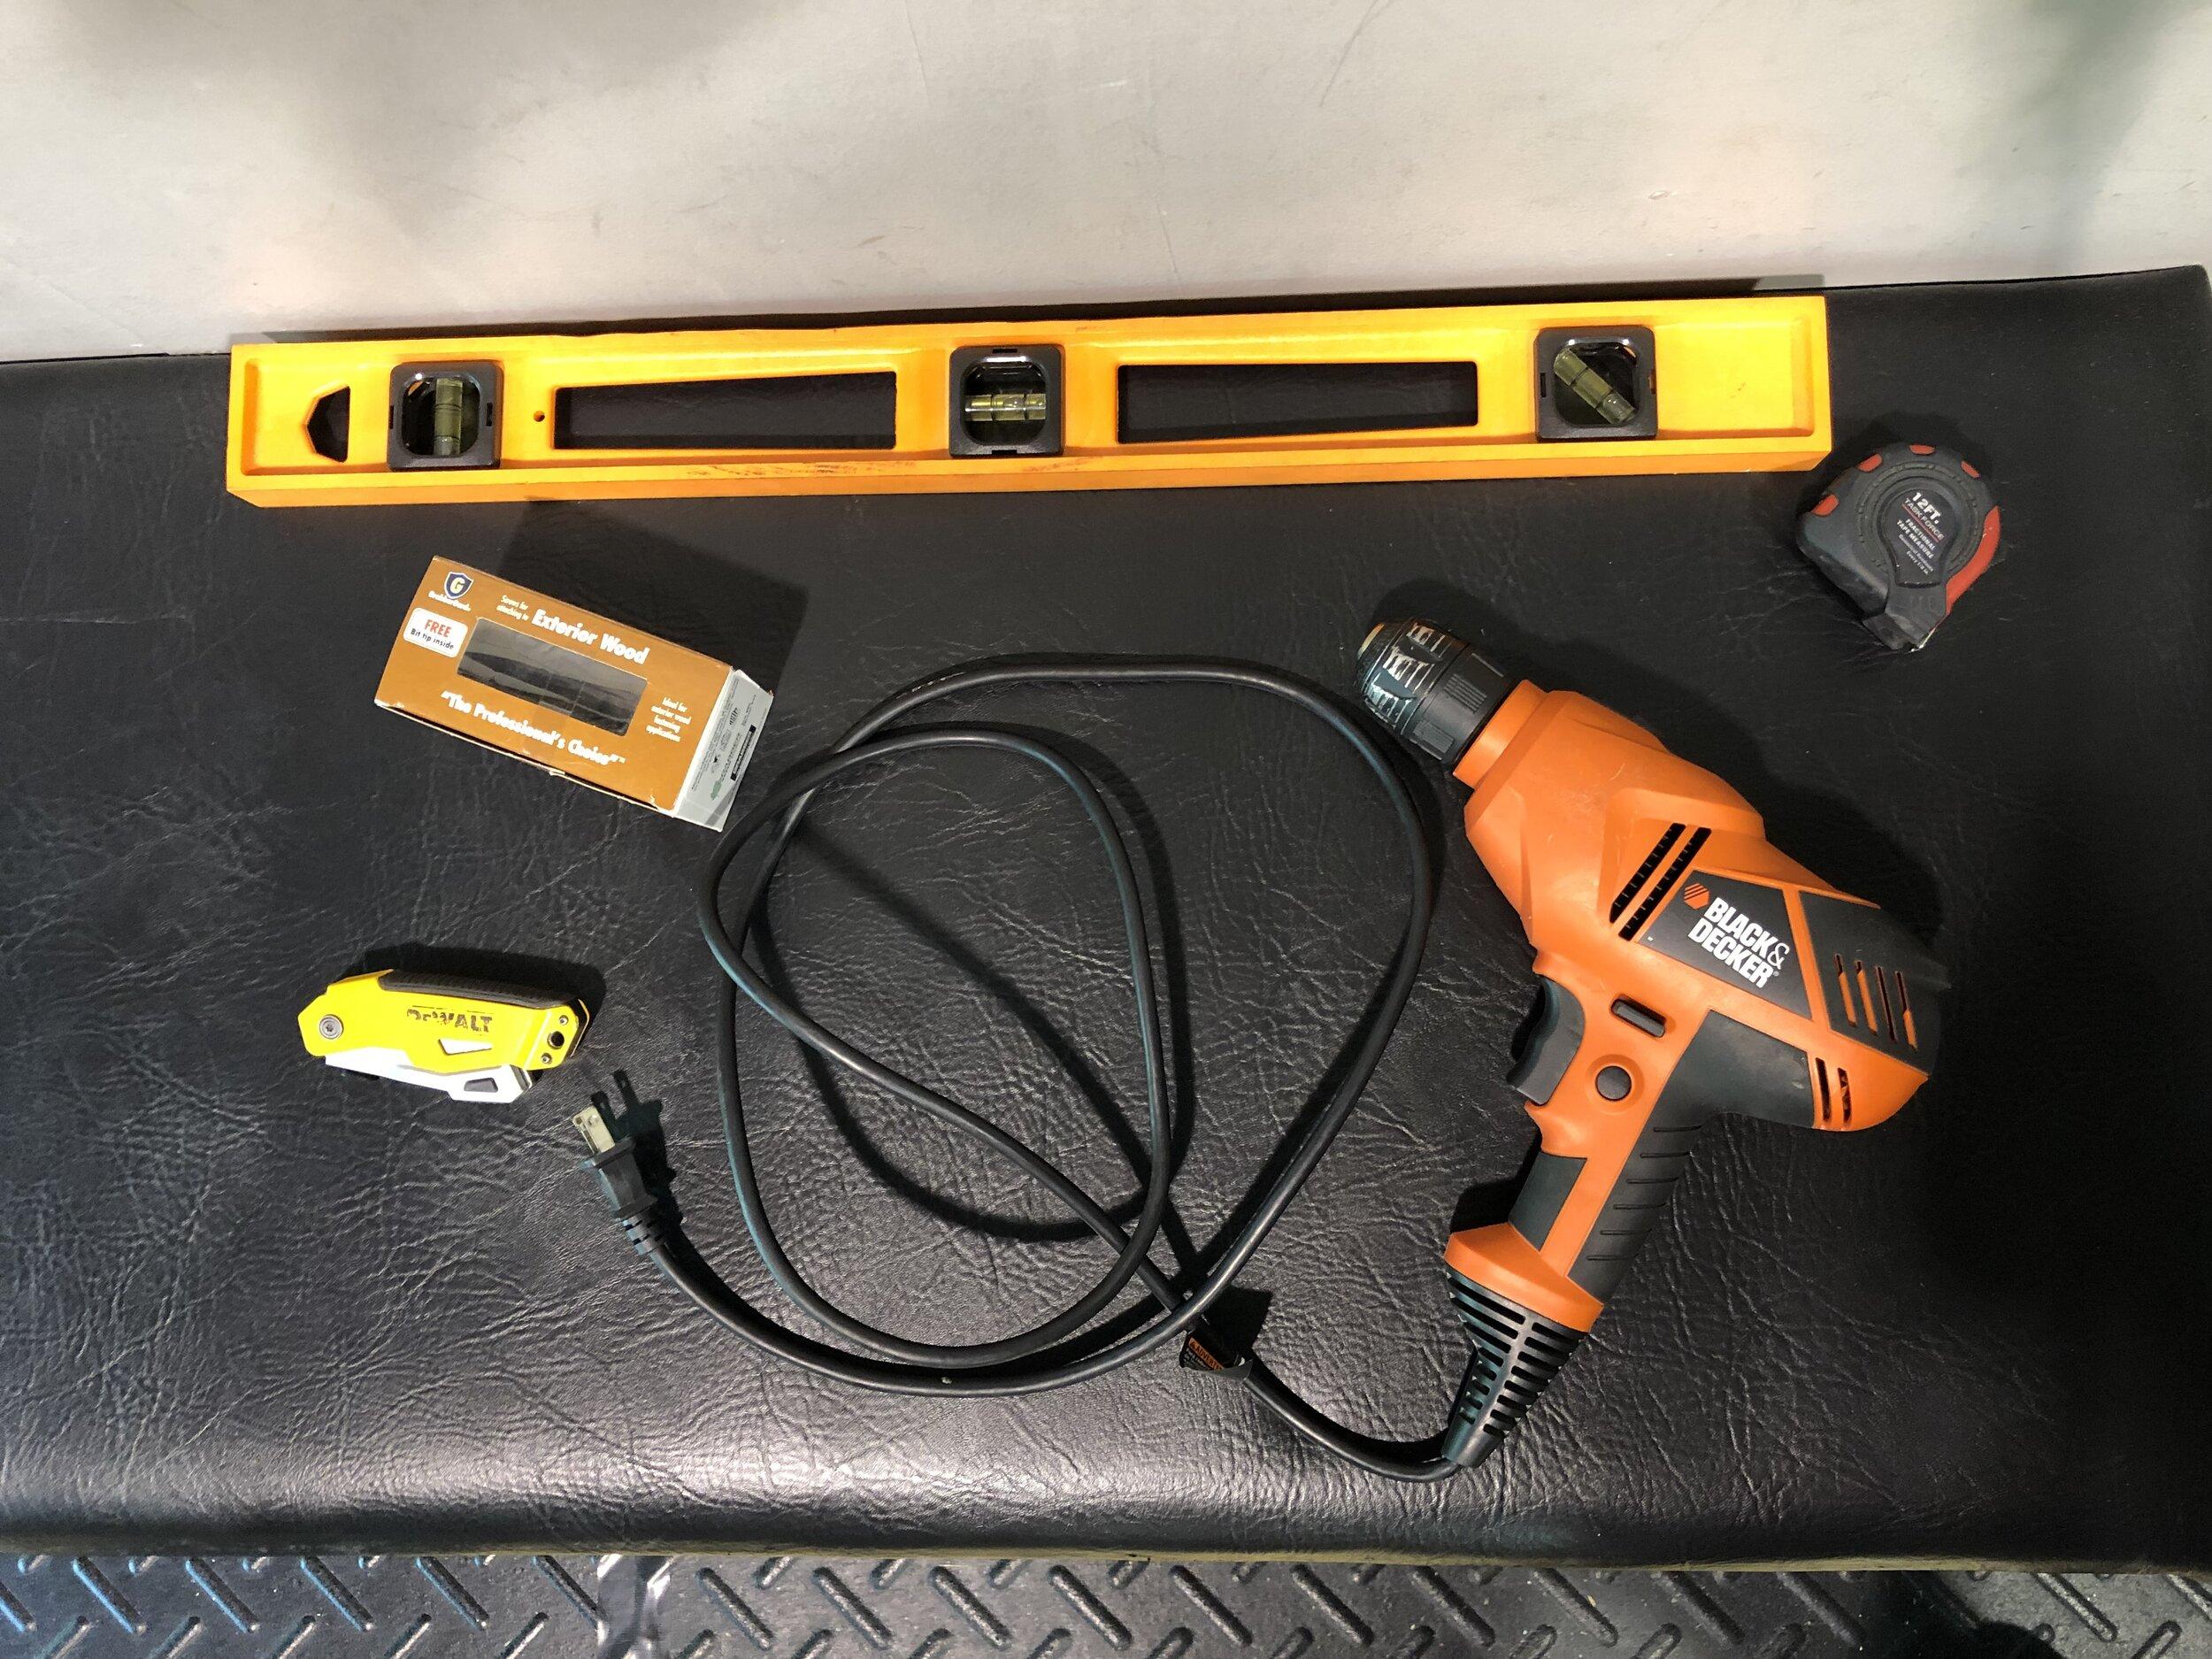 The minimum tools you'll need.